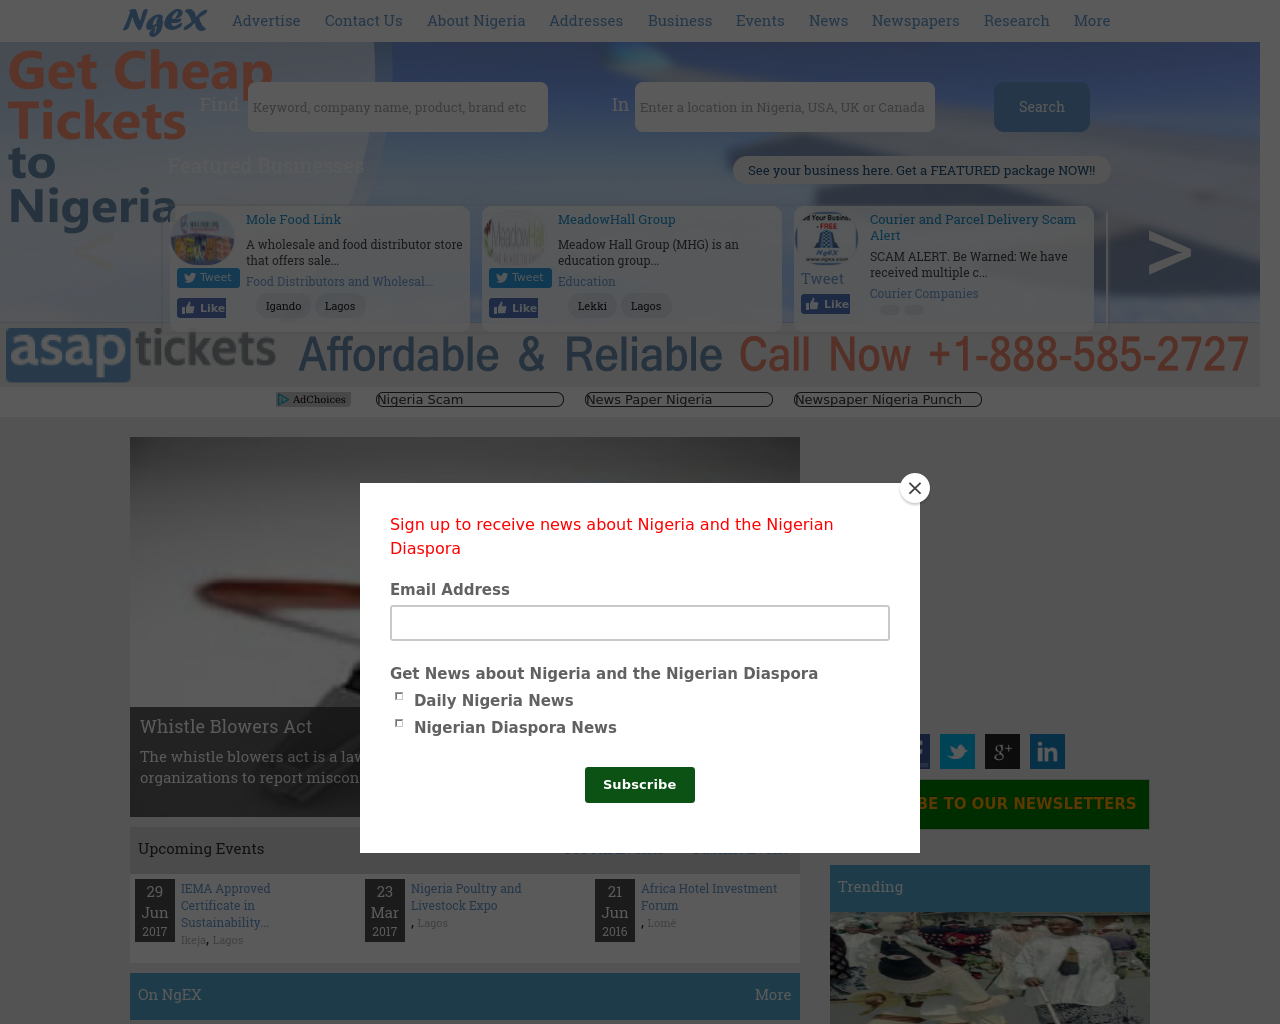 ngex.com-Advertising-Reviews-Pricing